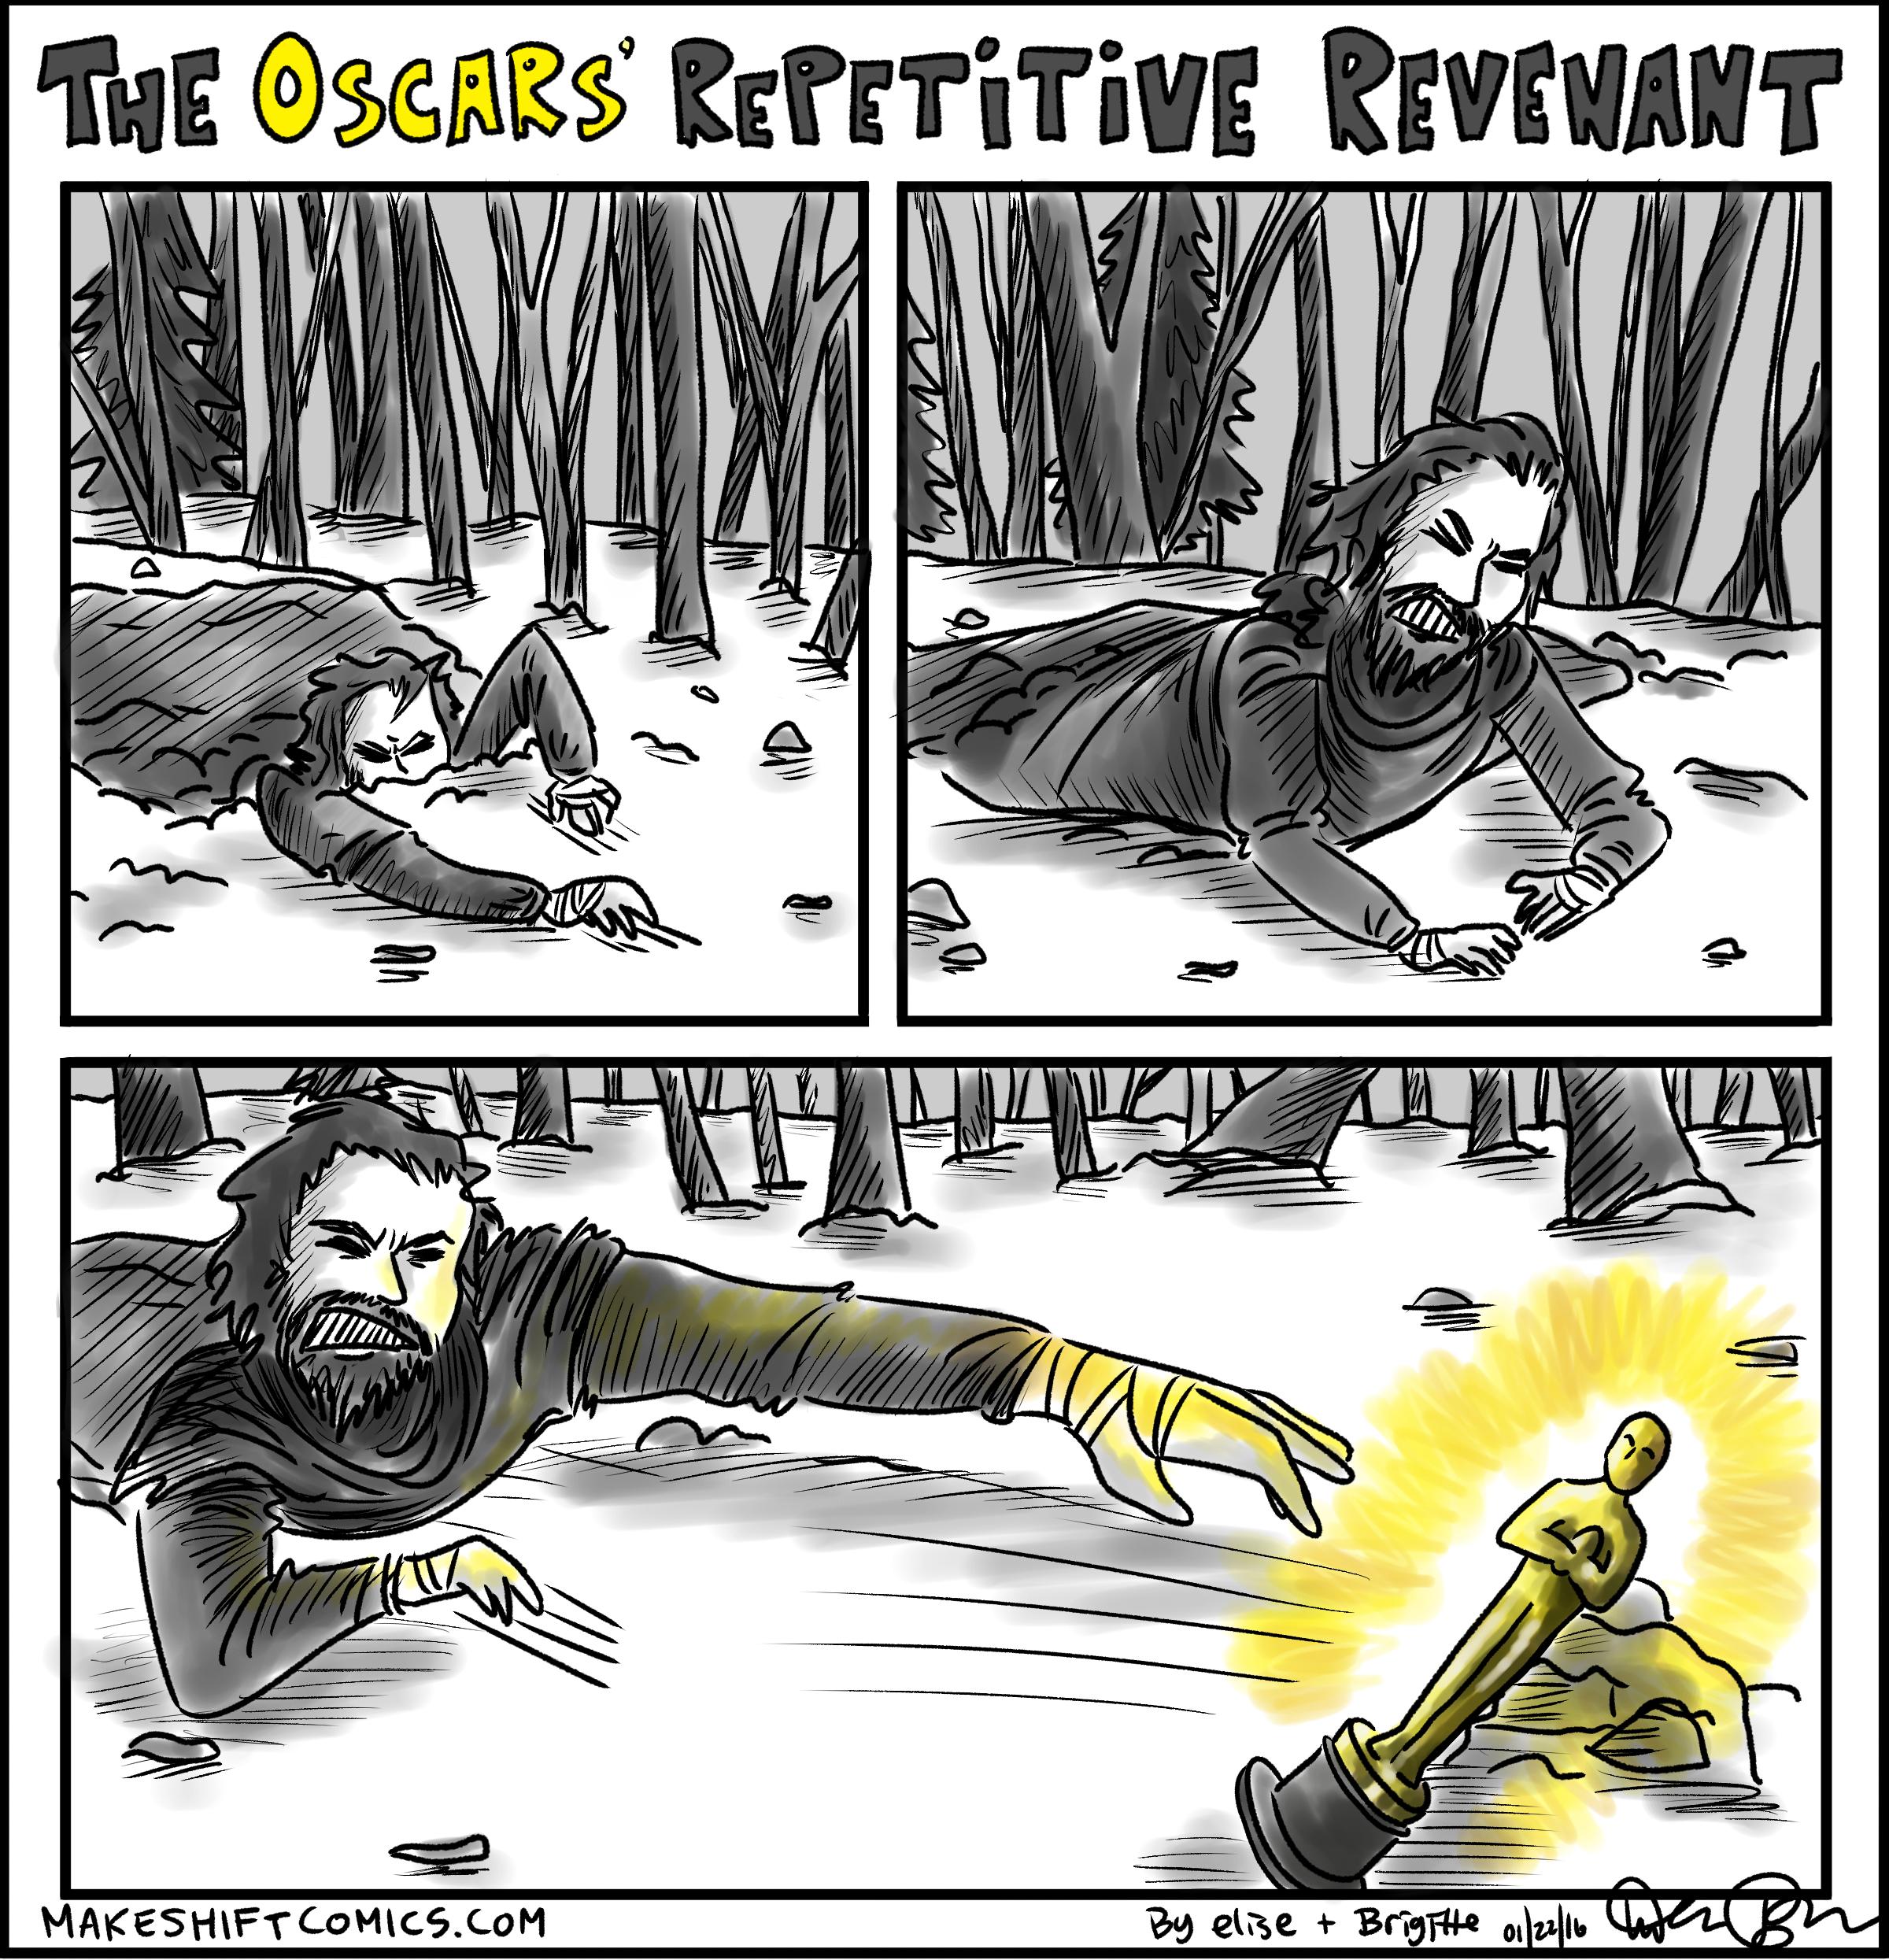 The Oscars' Repetitive Revenant